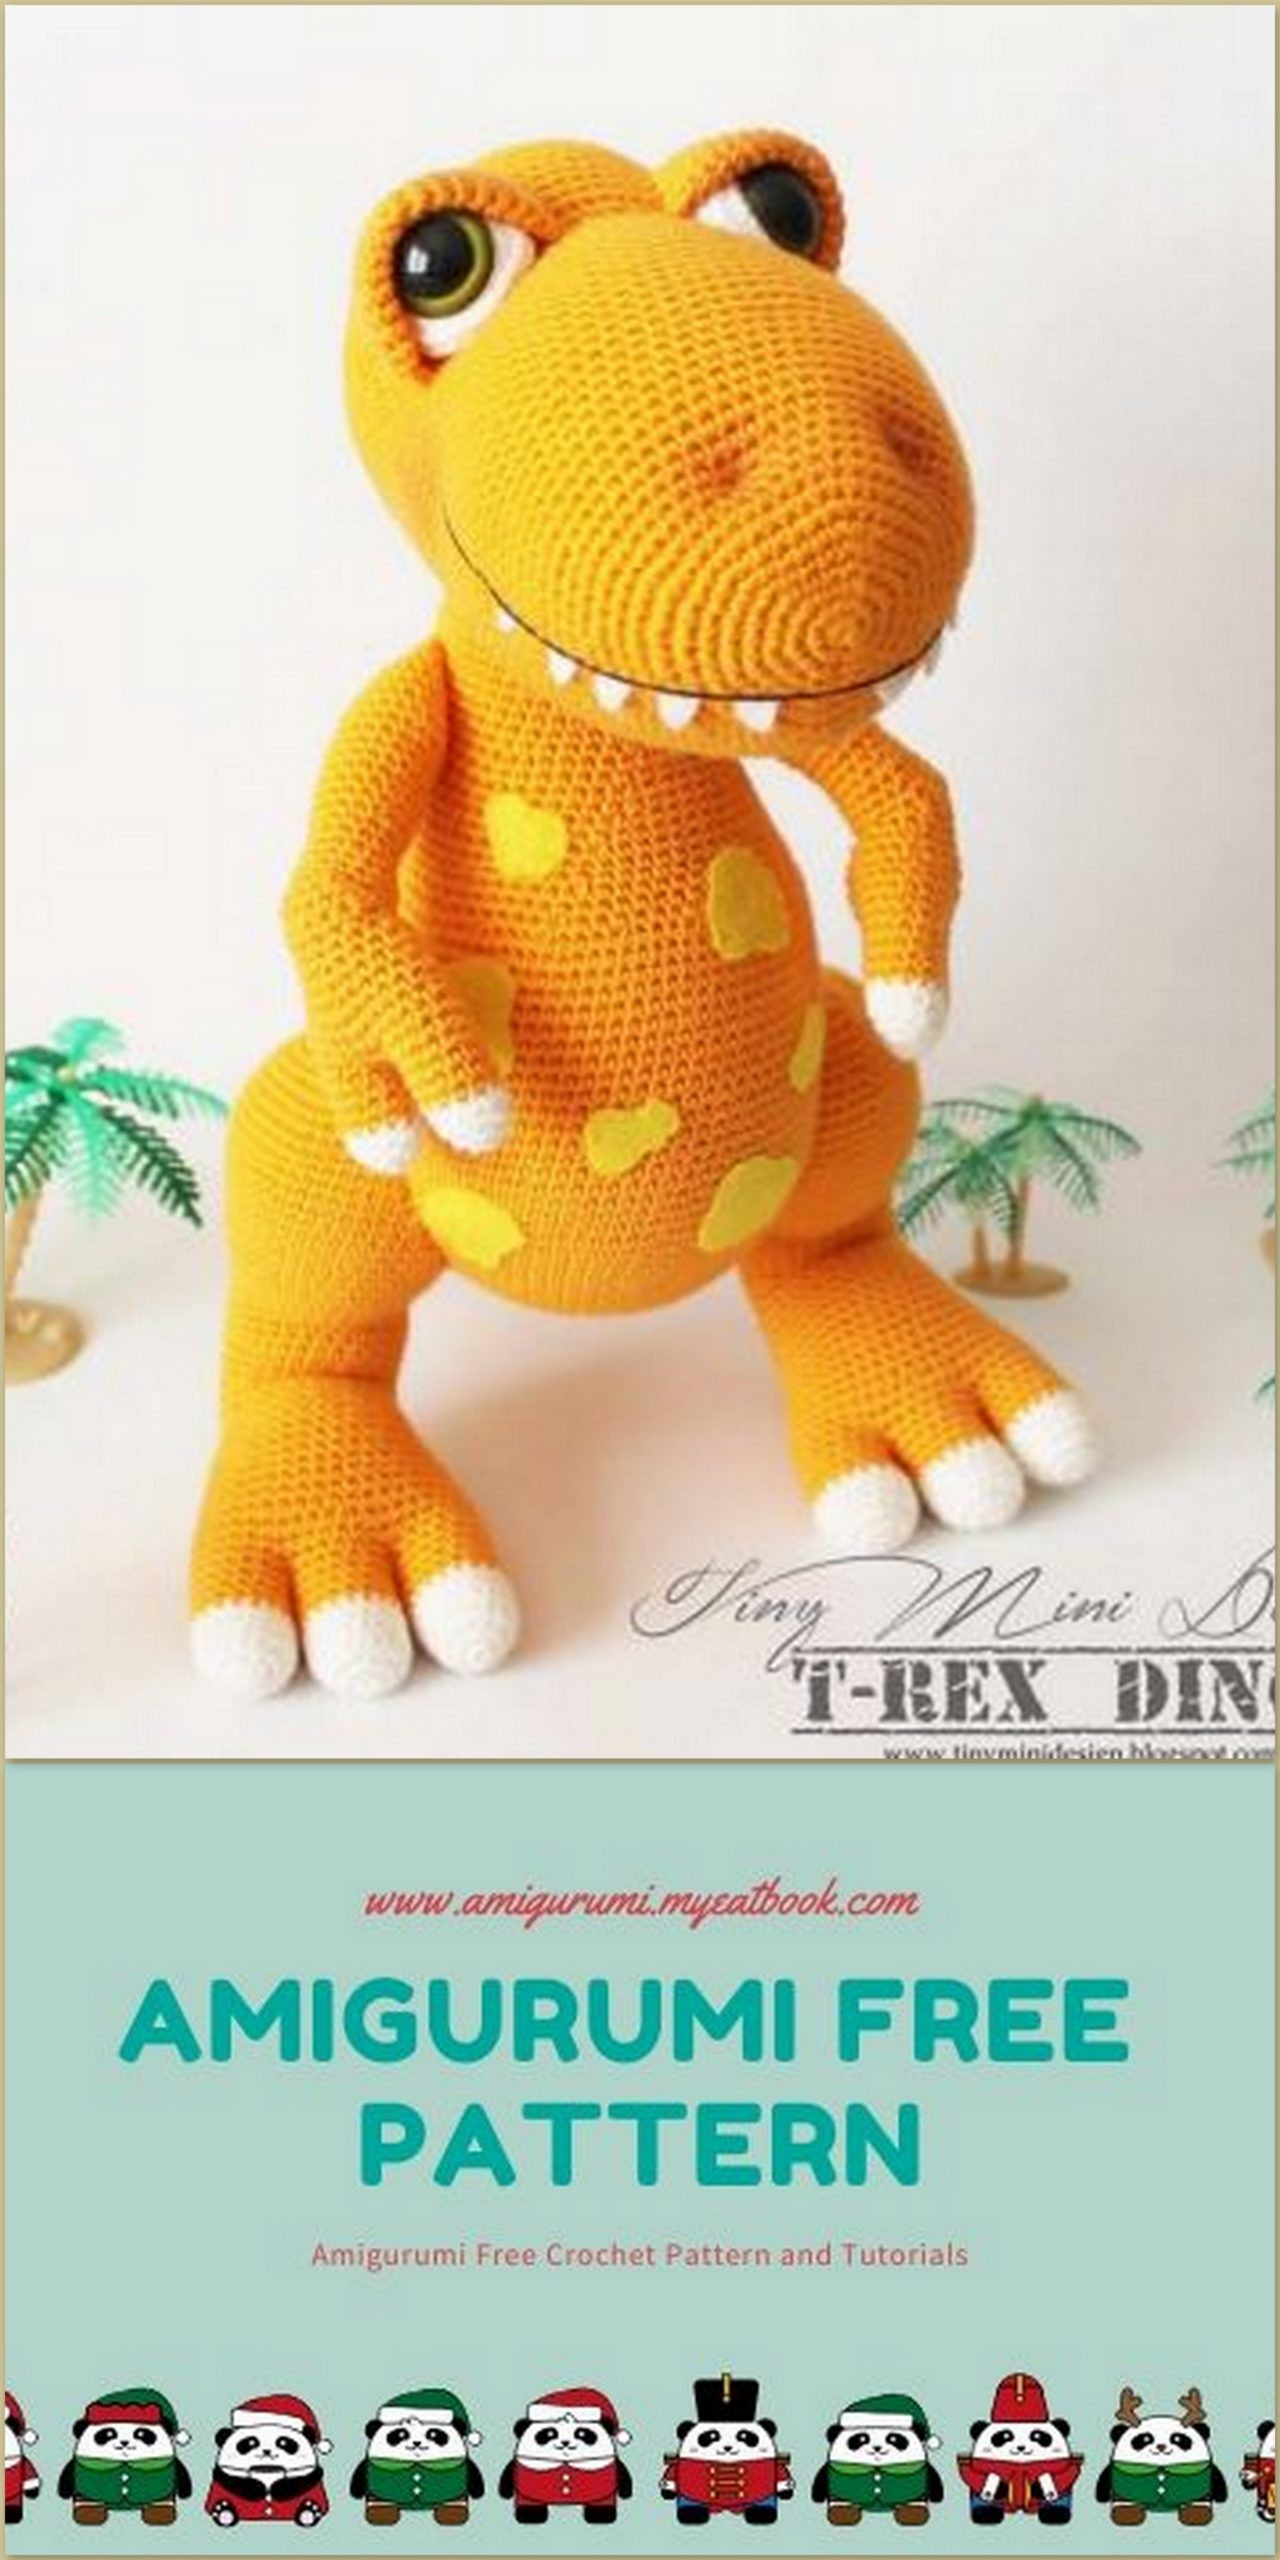 Amigurumi T Rex Dino Free Crochet Pattern Amigurumi Myeatbook Com